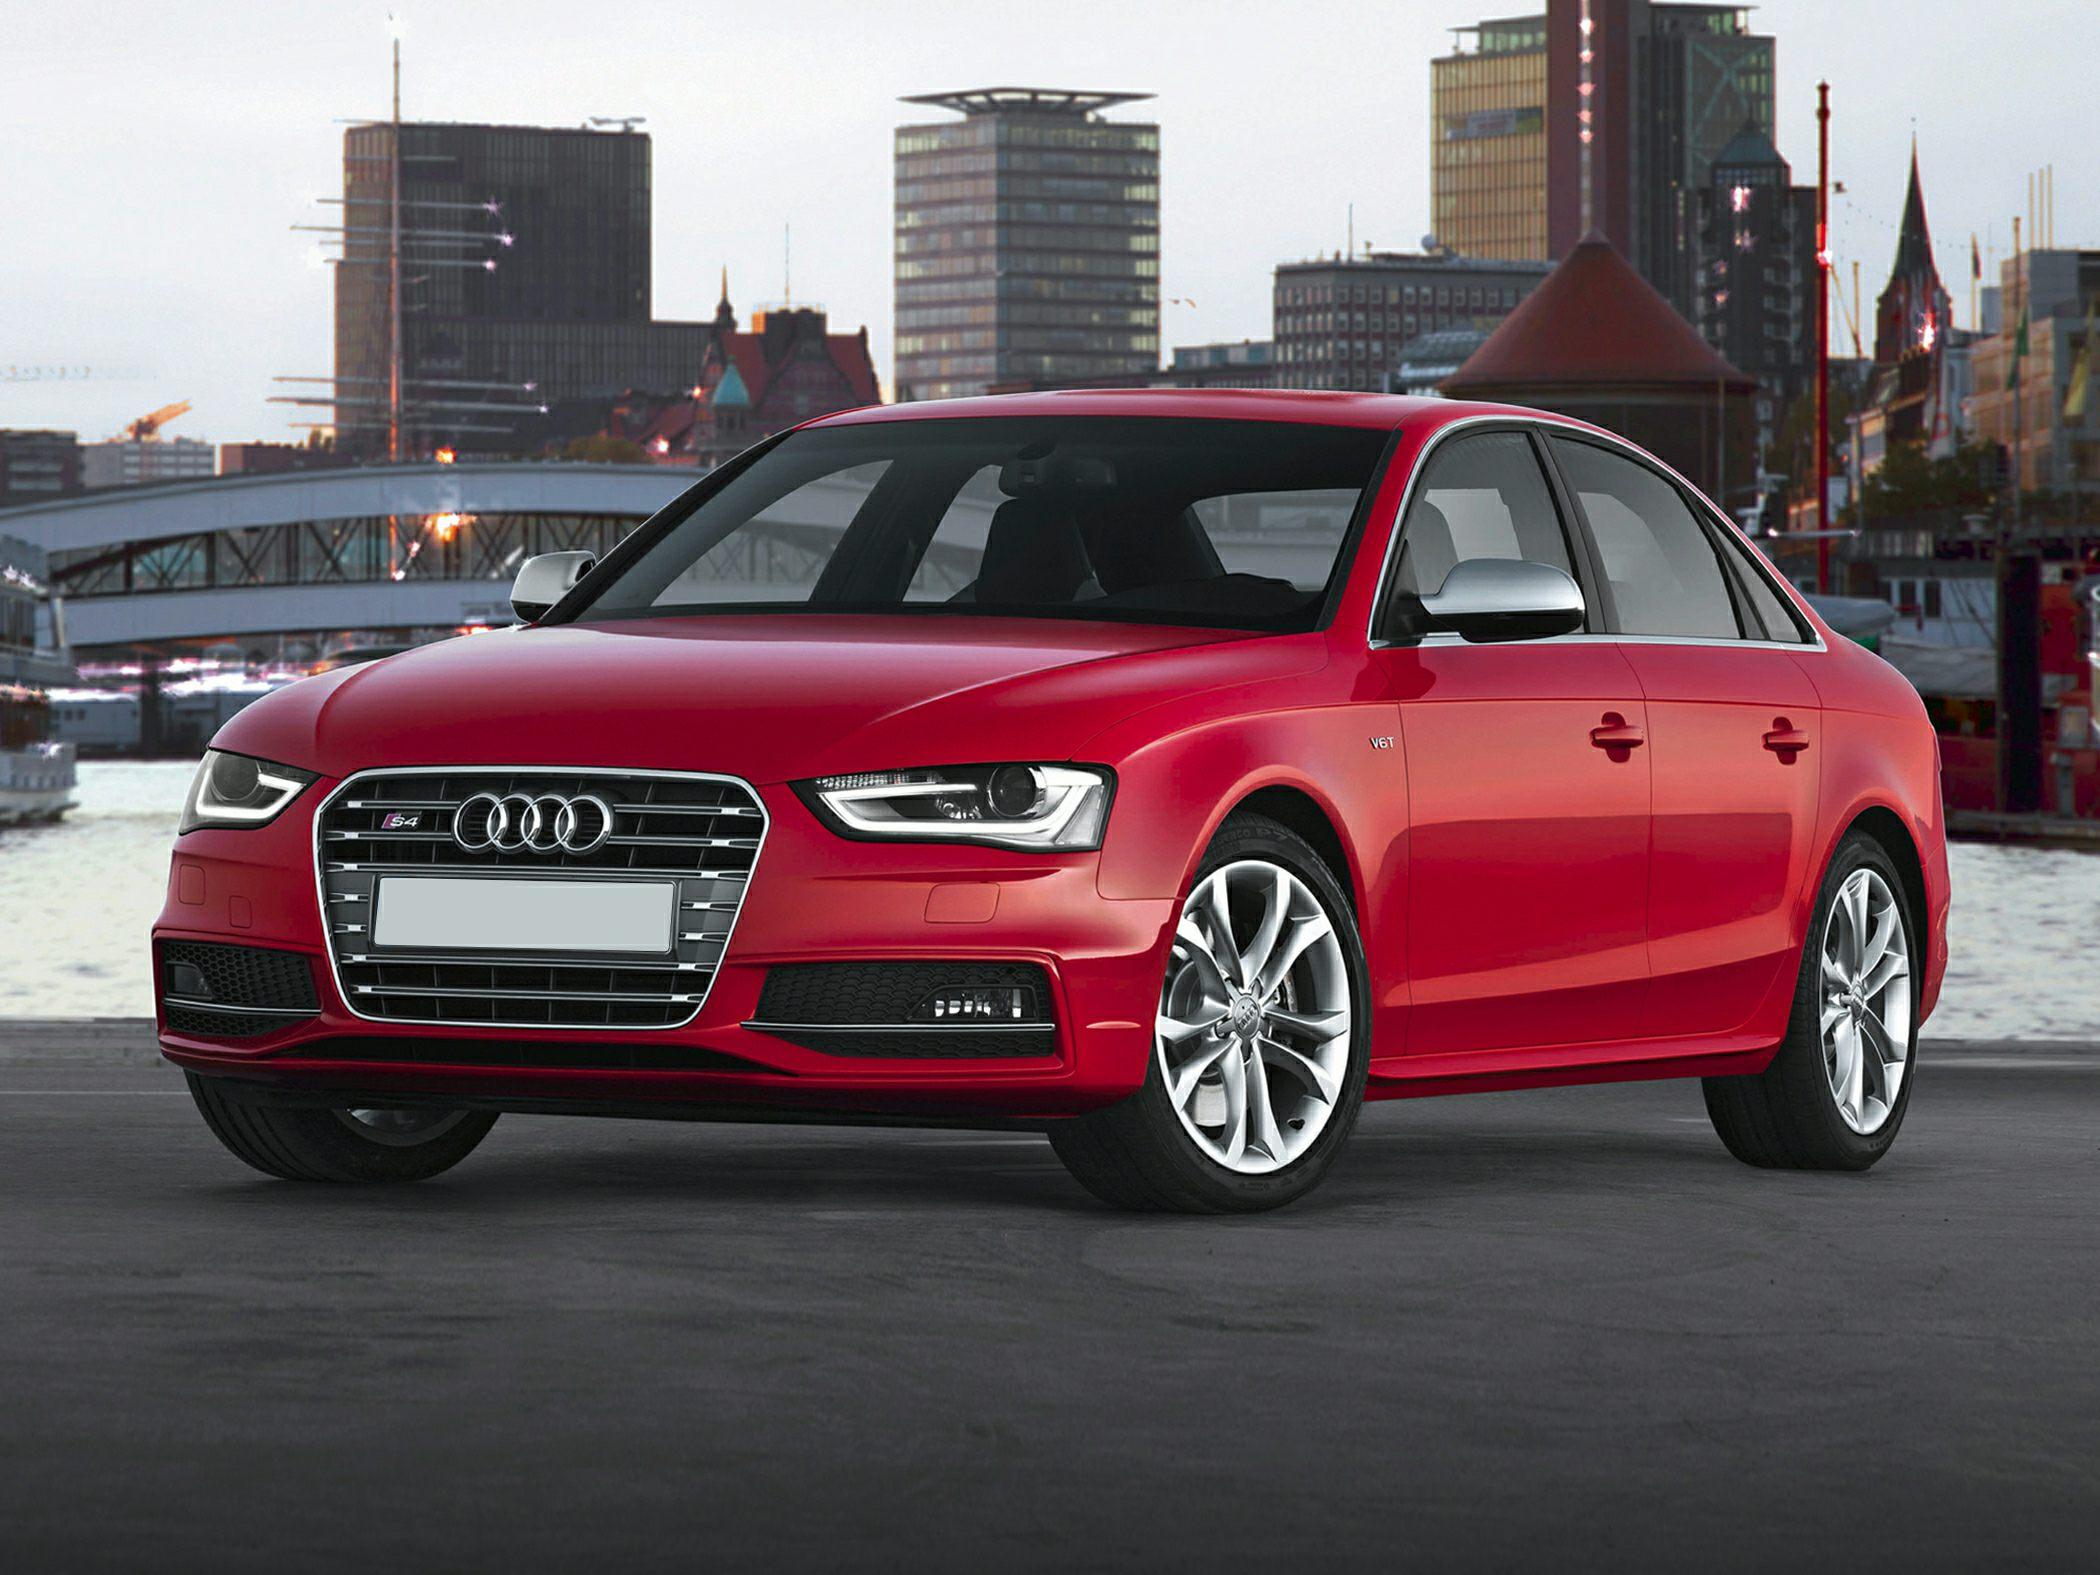 2014 Audi S4 Glam